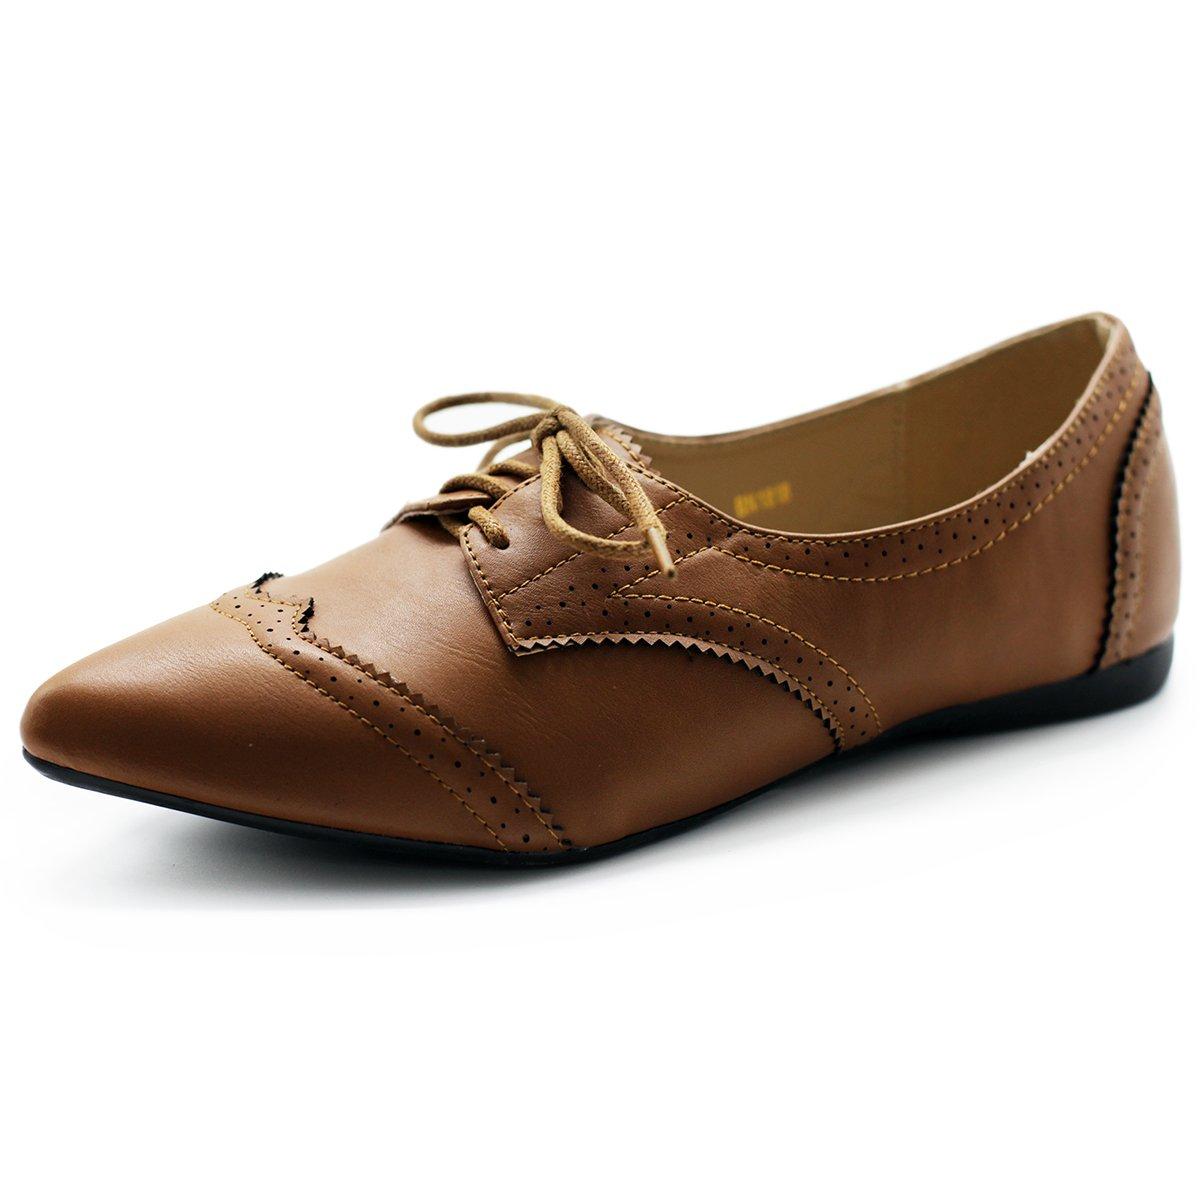 Ollio Women's Ballet Shoe Flat Enamel Pointed Toe Oxford M1818 (7.5 B(M) US, Brown)